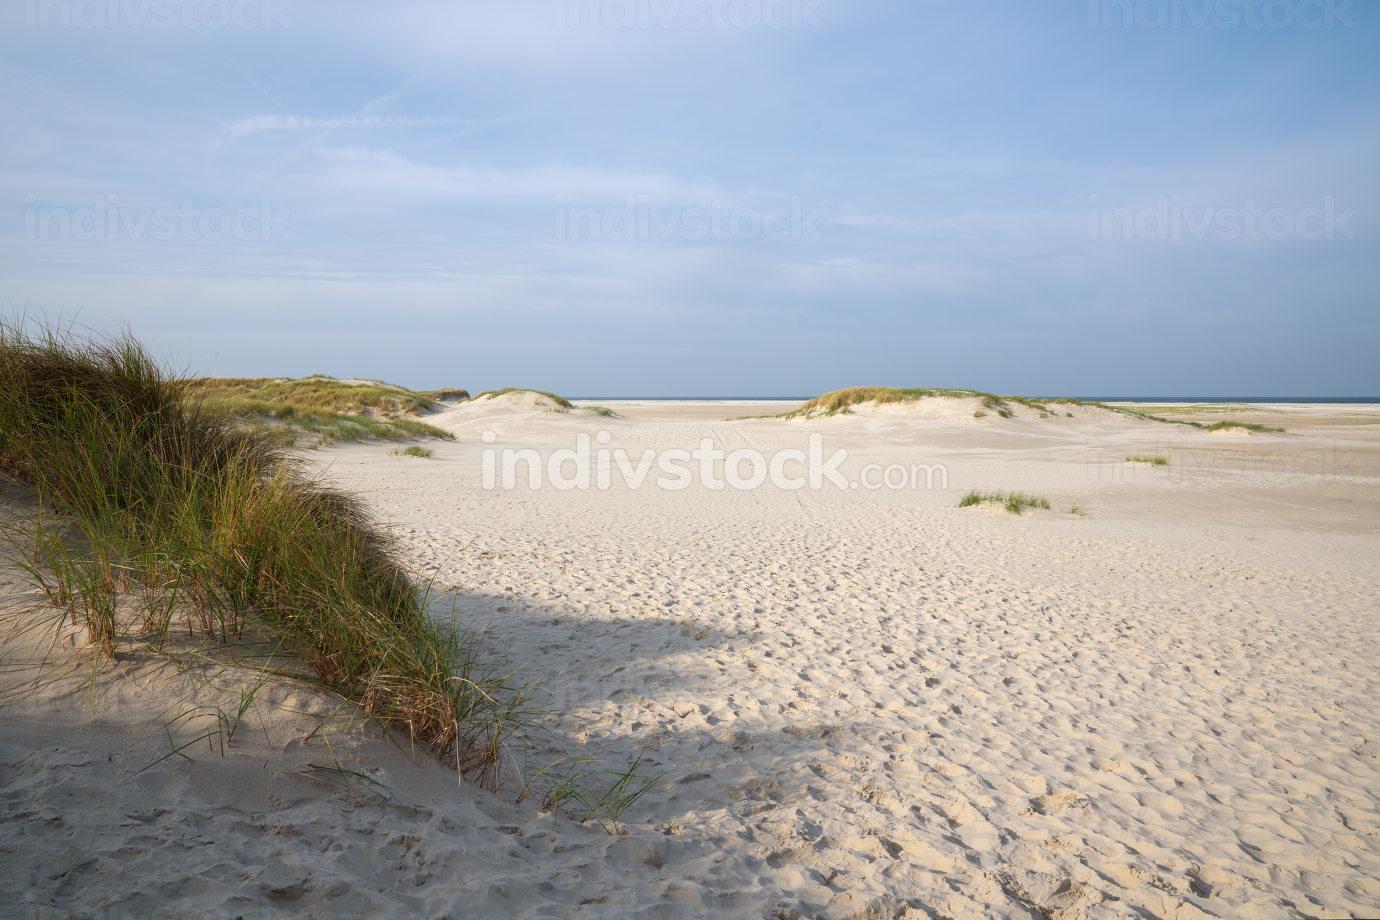 Beach at the coastline of Amrum, North Frisia, Germany